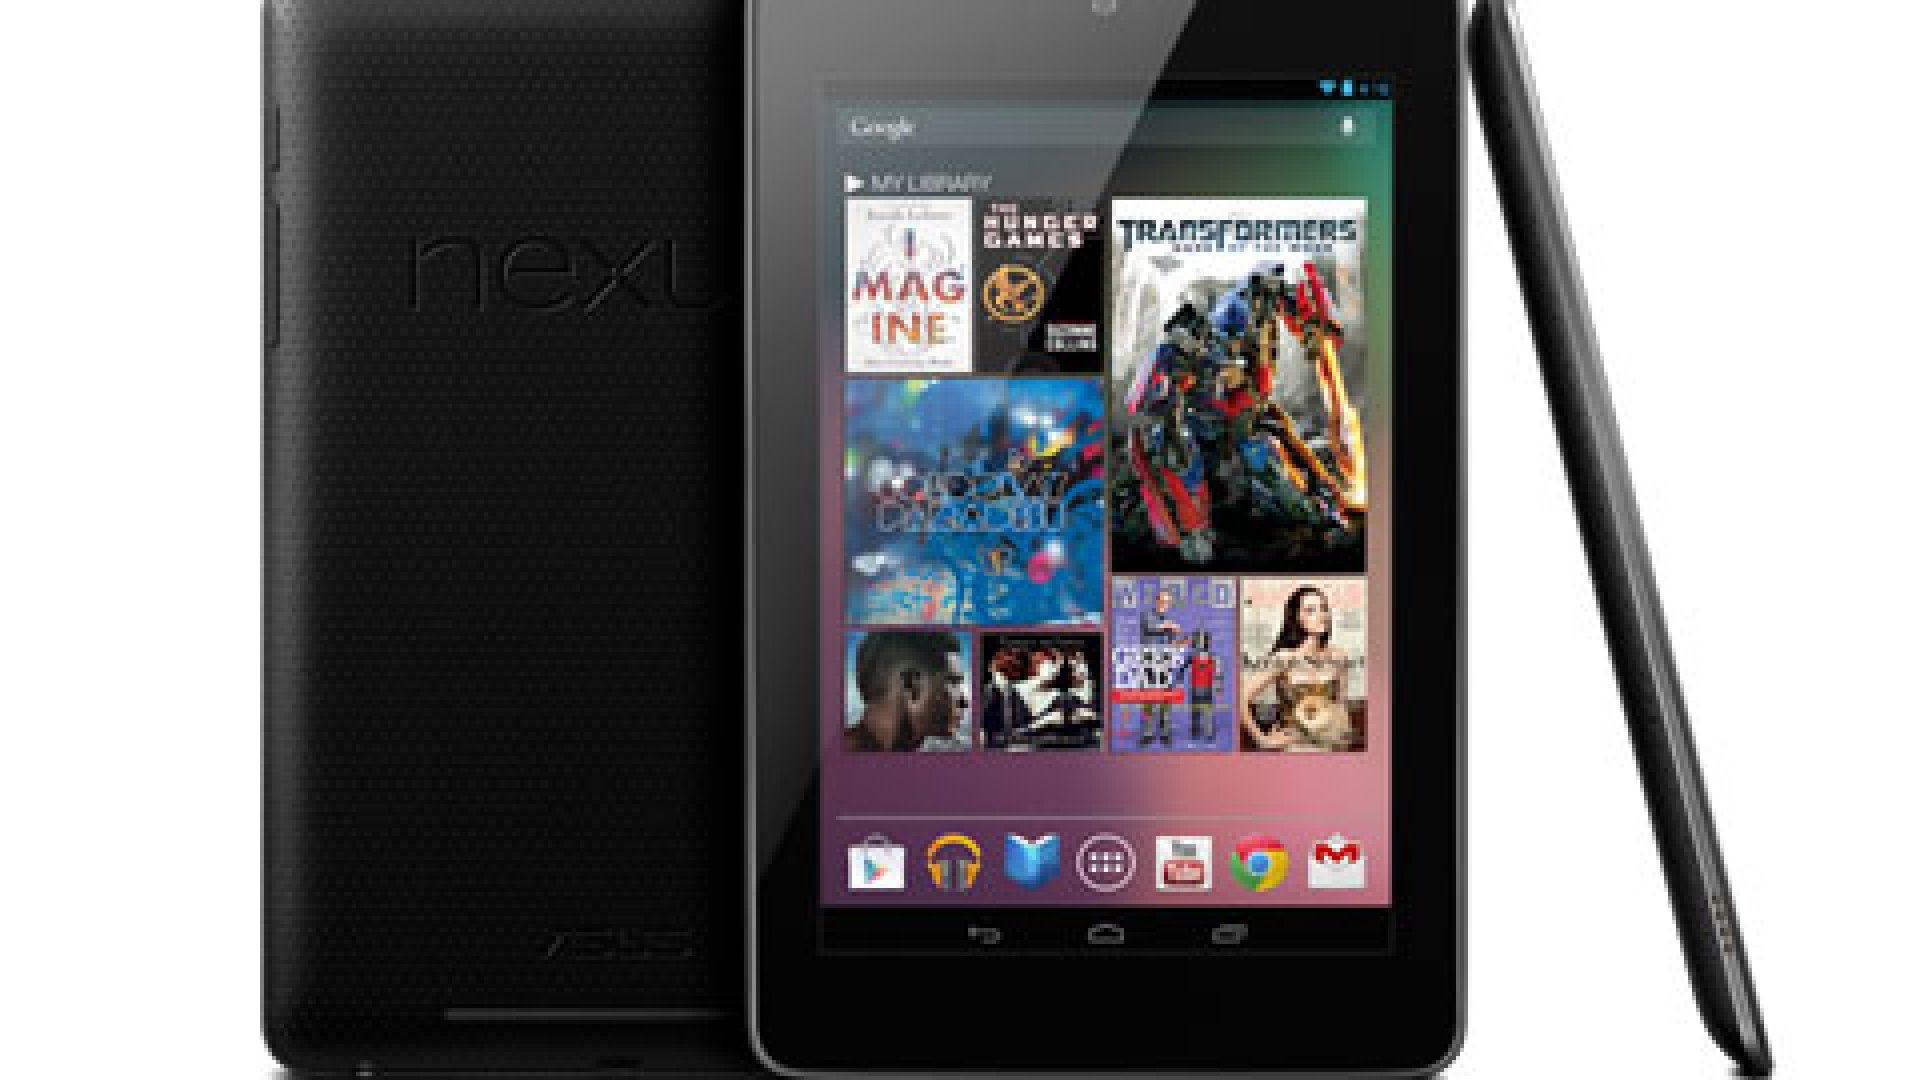 The Google Nexus 7 tablet